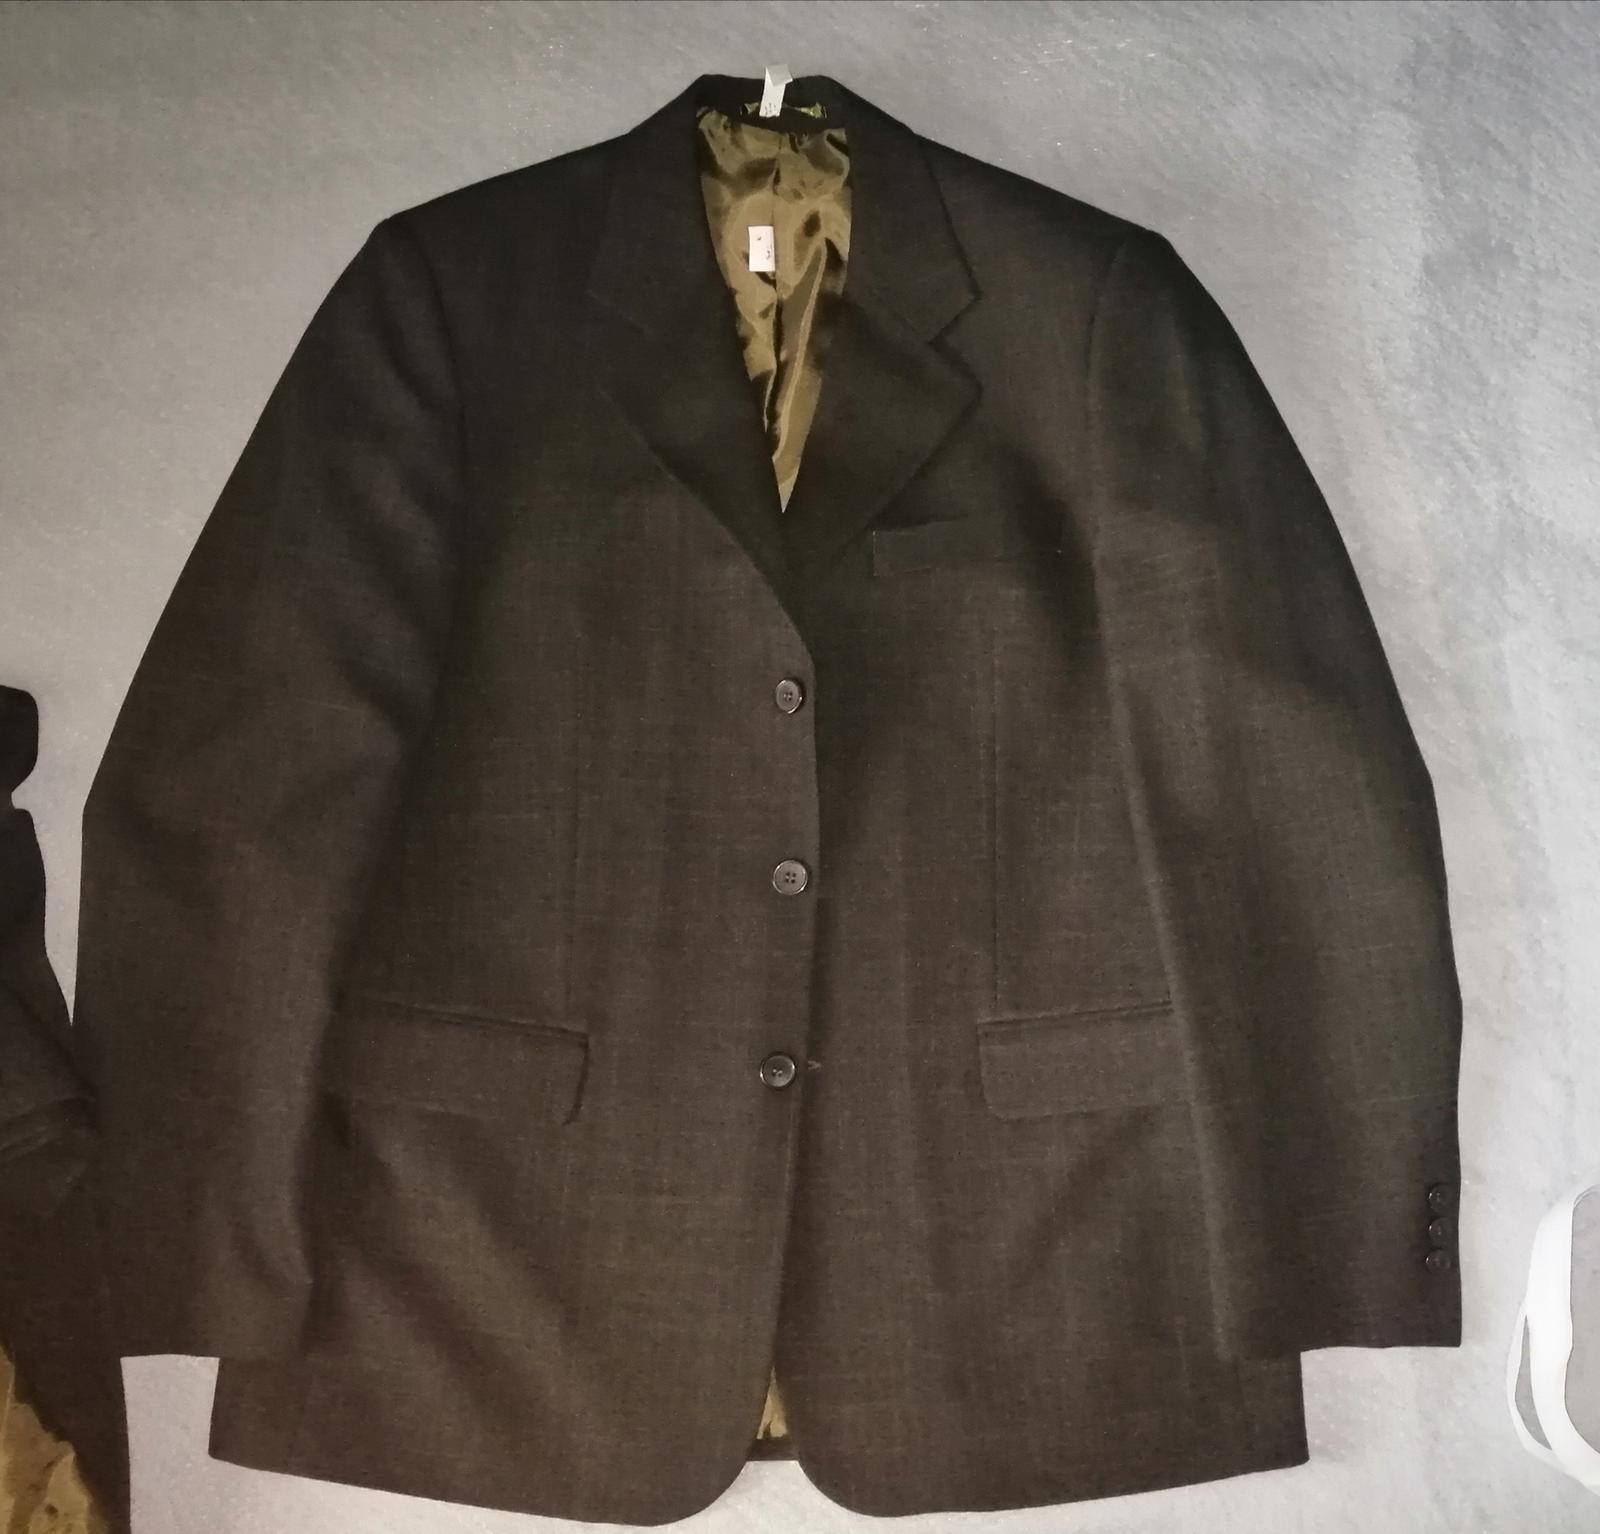 Tmavo hnedý oblek s vestou - Obrázok č. 1